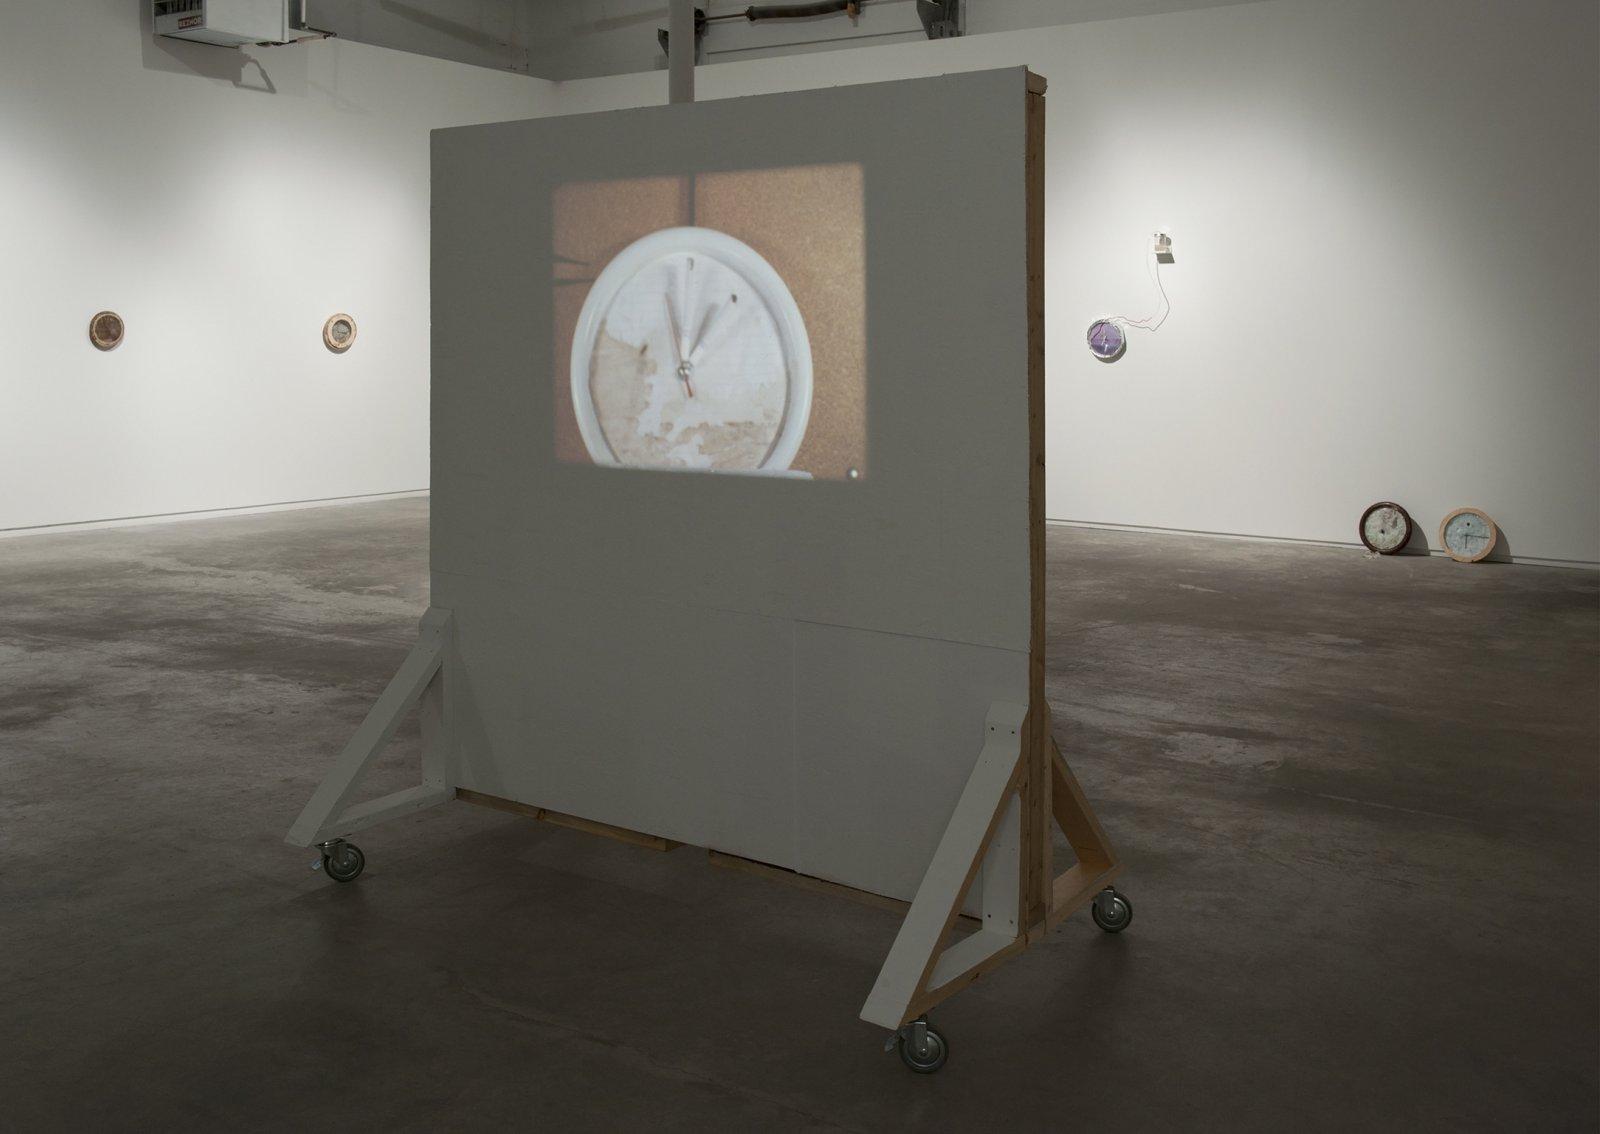 Julia Feyrer, Dailies, 2012, 16mm film loop, silent, 20 minutes, 79 x 72 x 44 in. (200 x 183 x 112 cm)